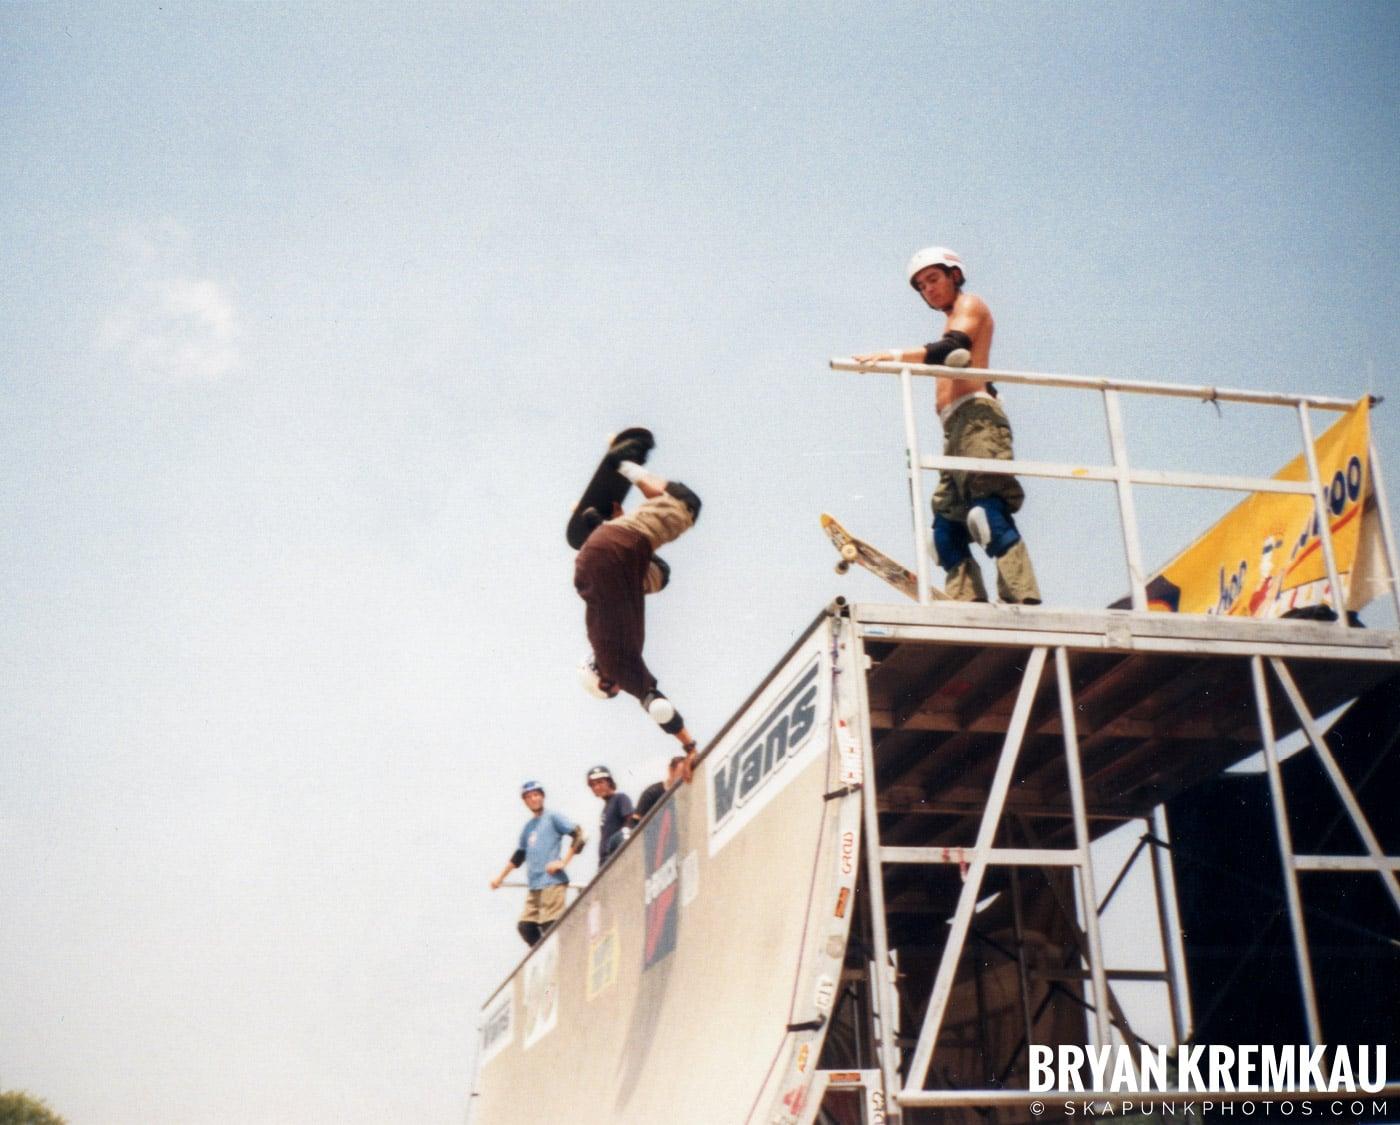 Skaters @ Vans Warped Tour, Randall's Island, NYC - 7.16.99 (13)